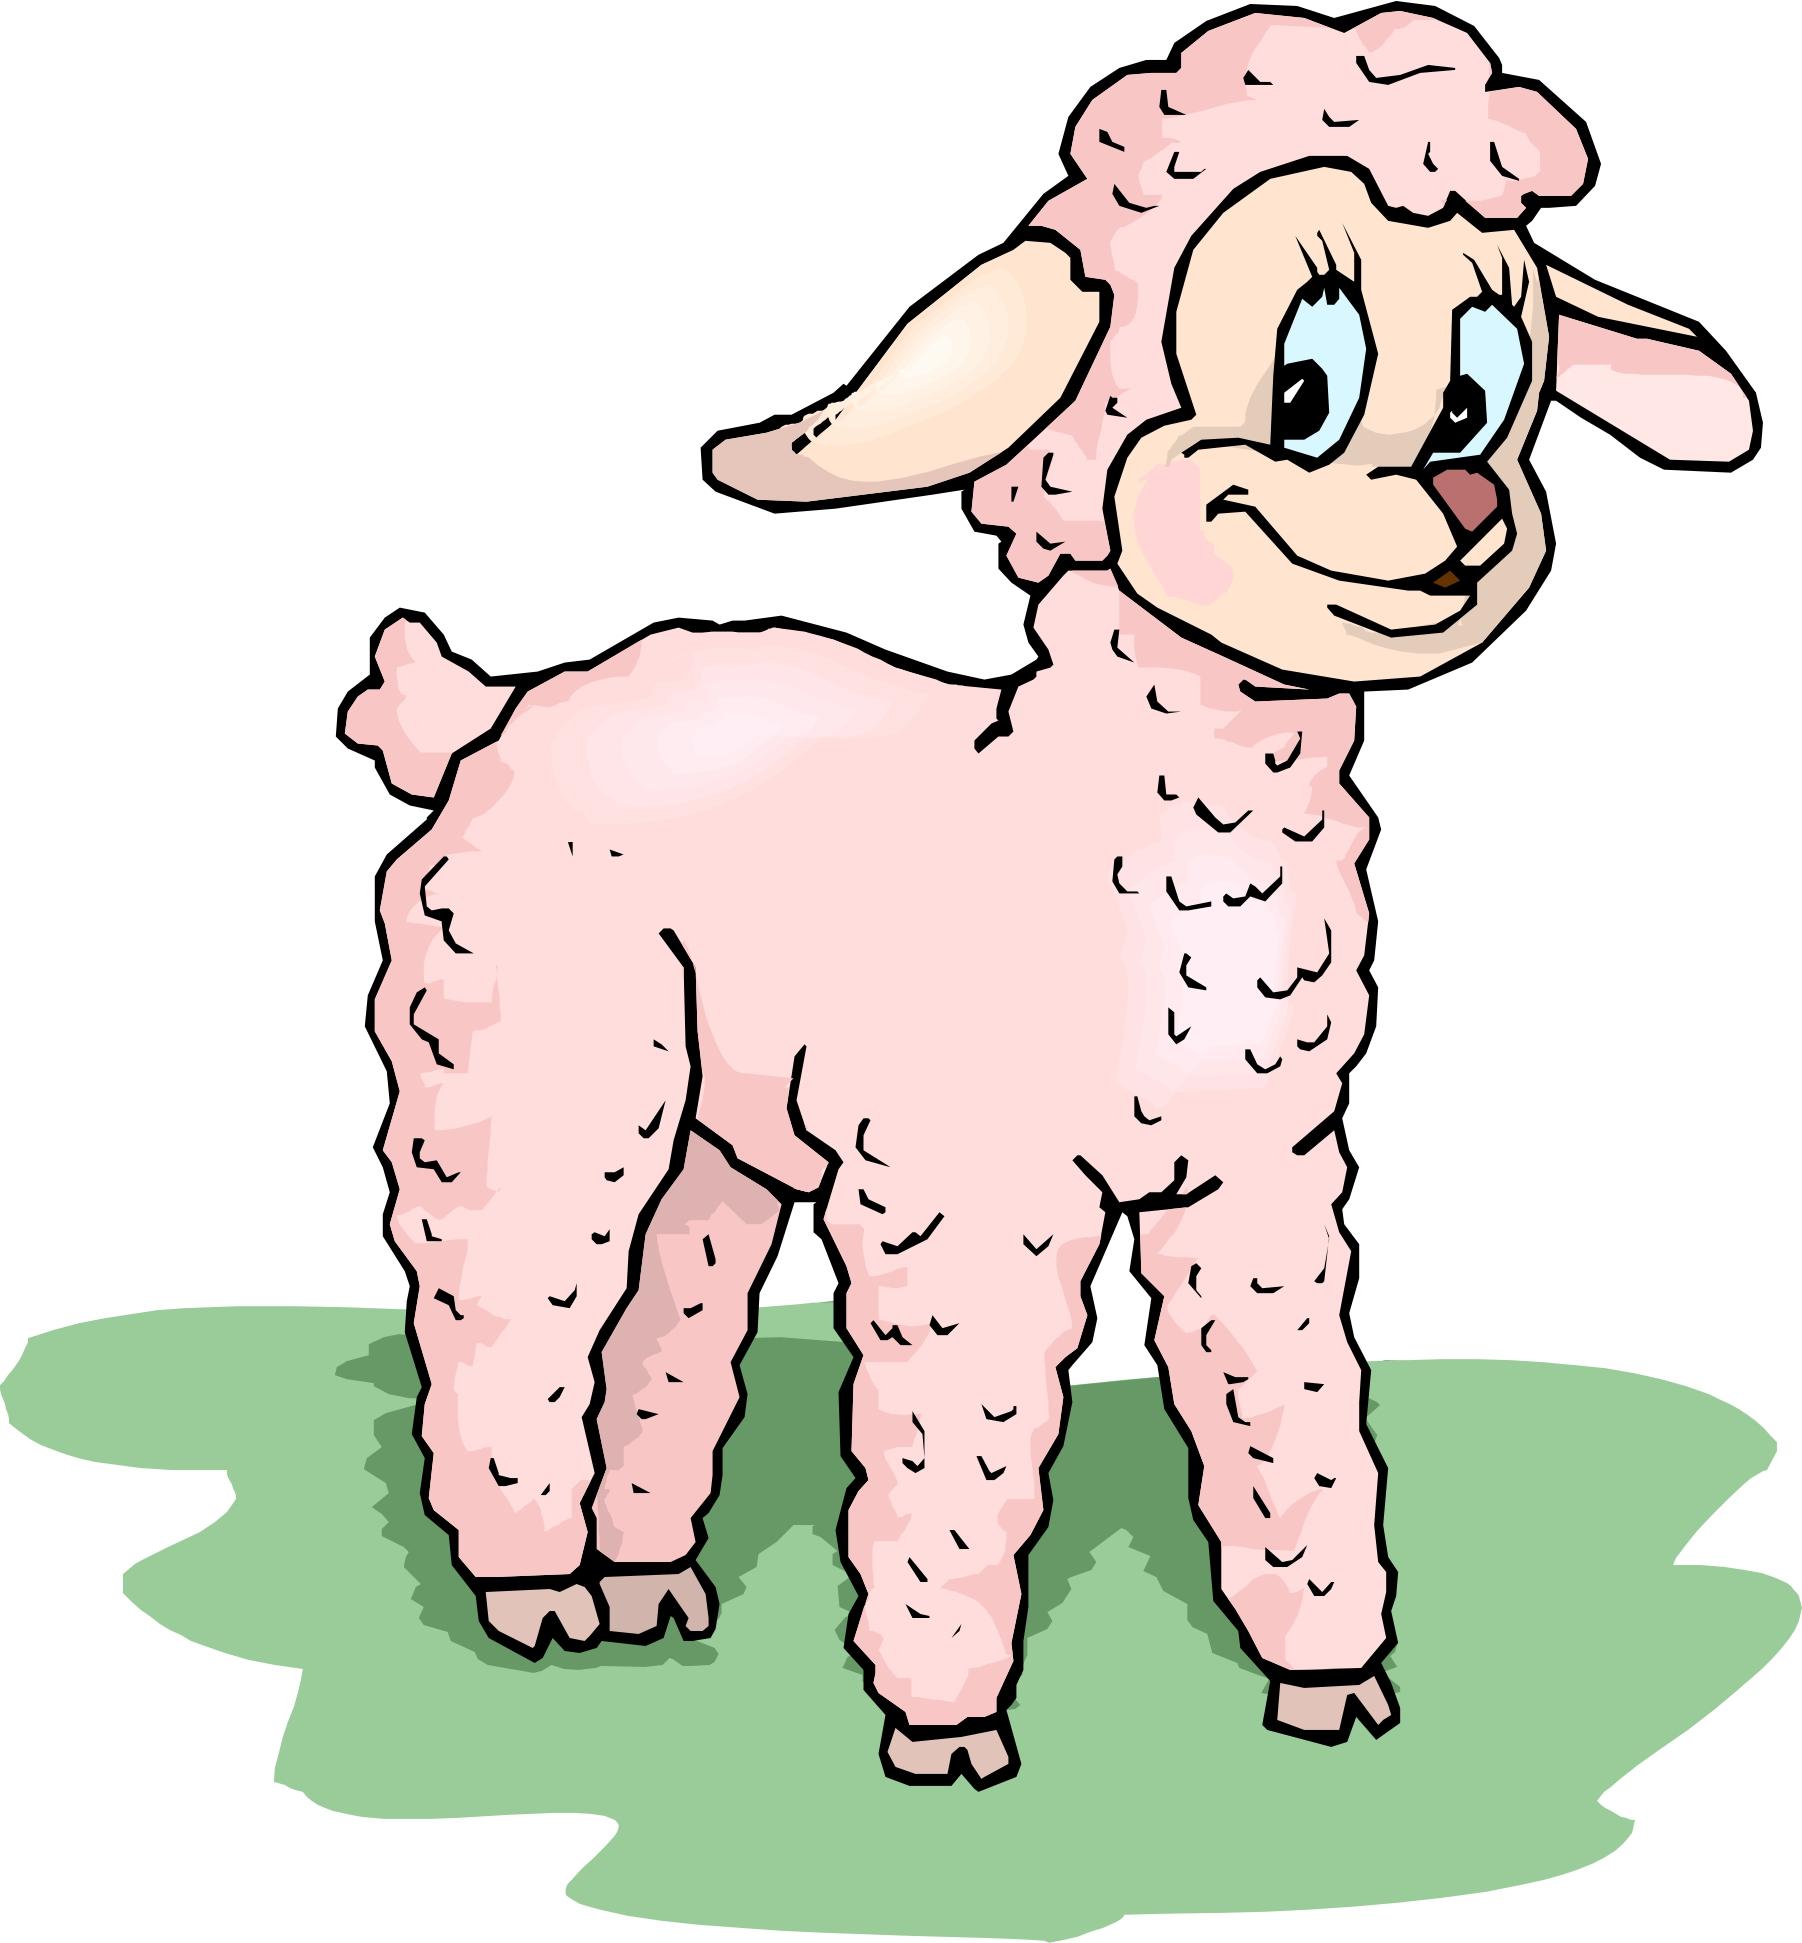 Cartoon Sheep   Page 2 - ClipArt Best - ClipArt Best